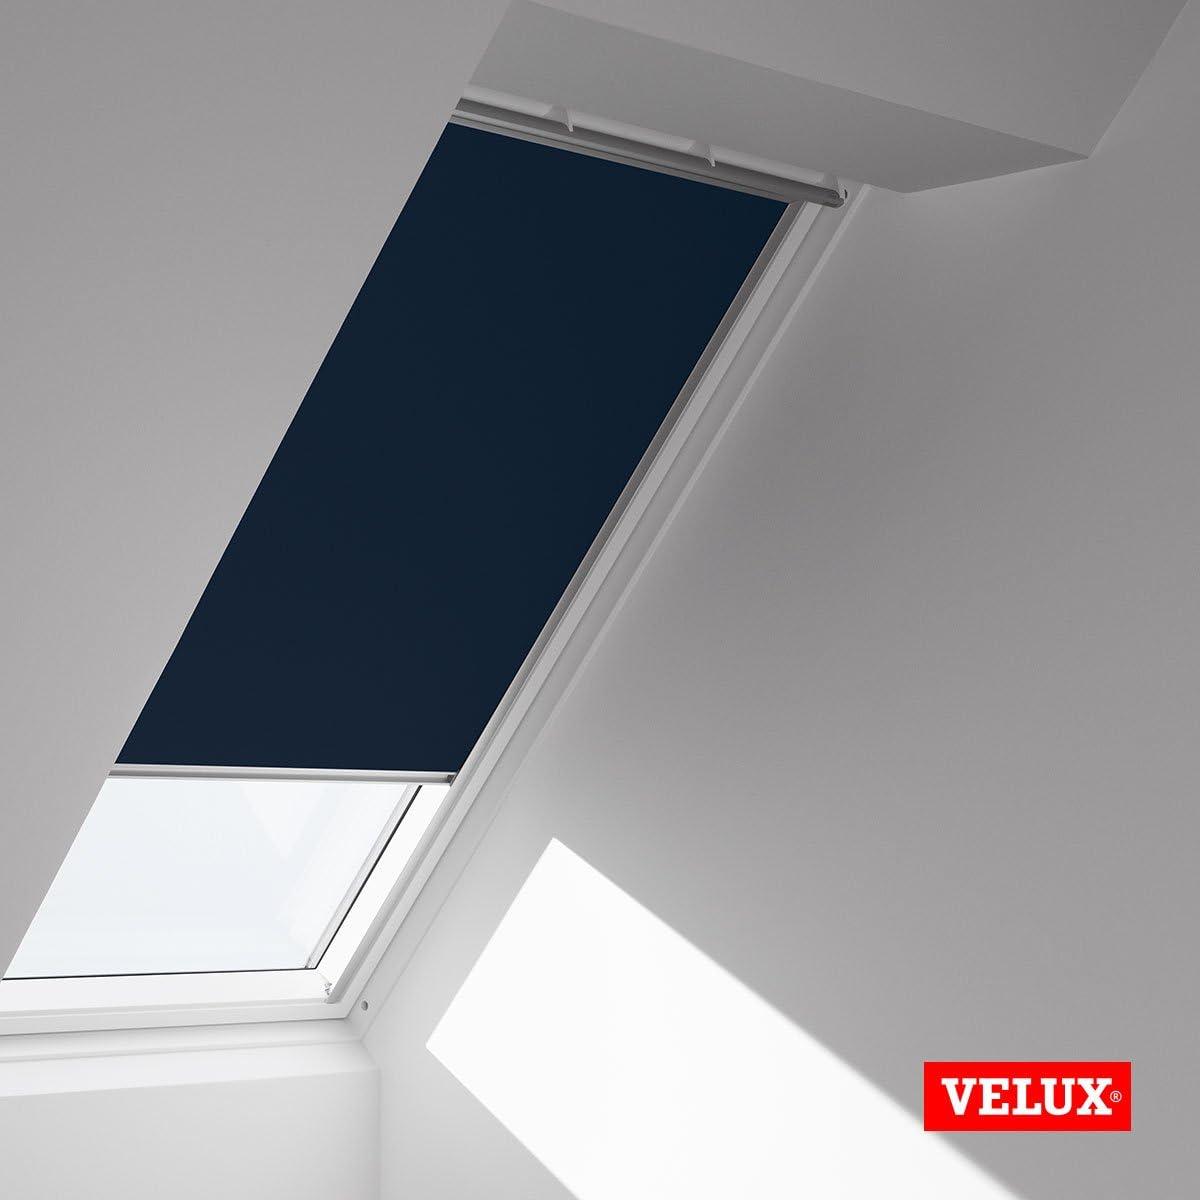 /Dark Blue 1100 Clearance Velux/ /Tende per finestra da tetto GGL S01/